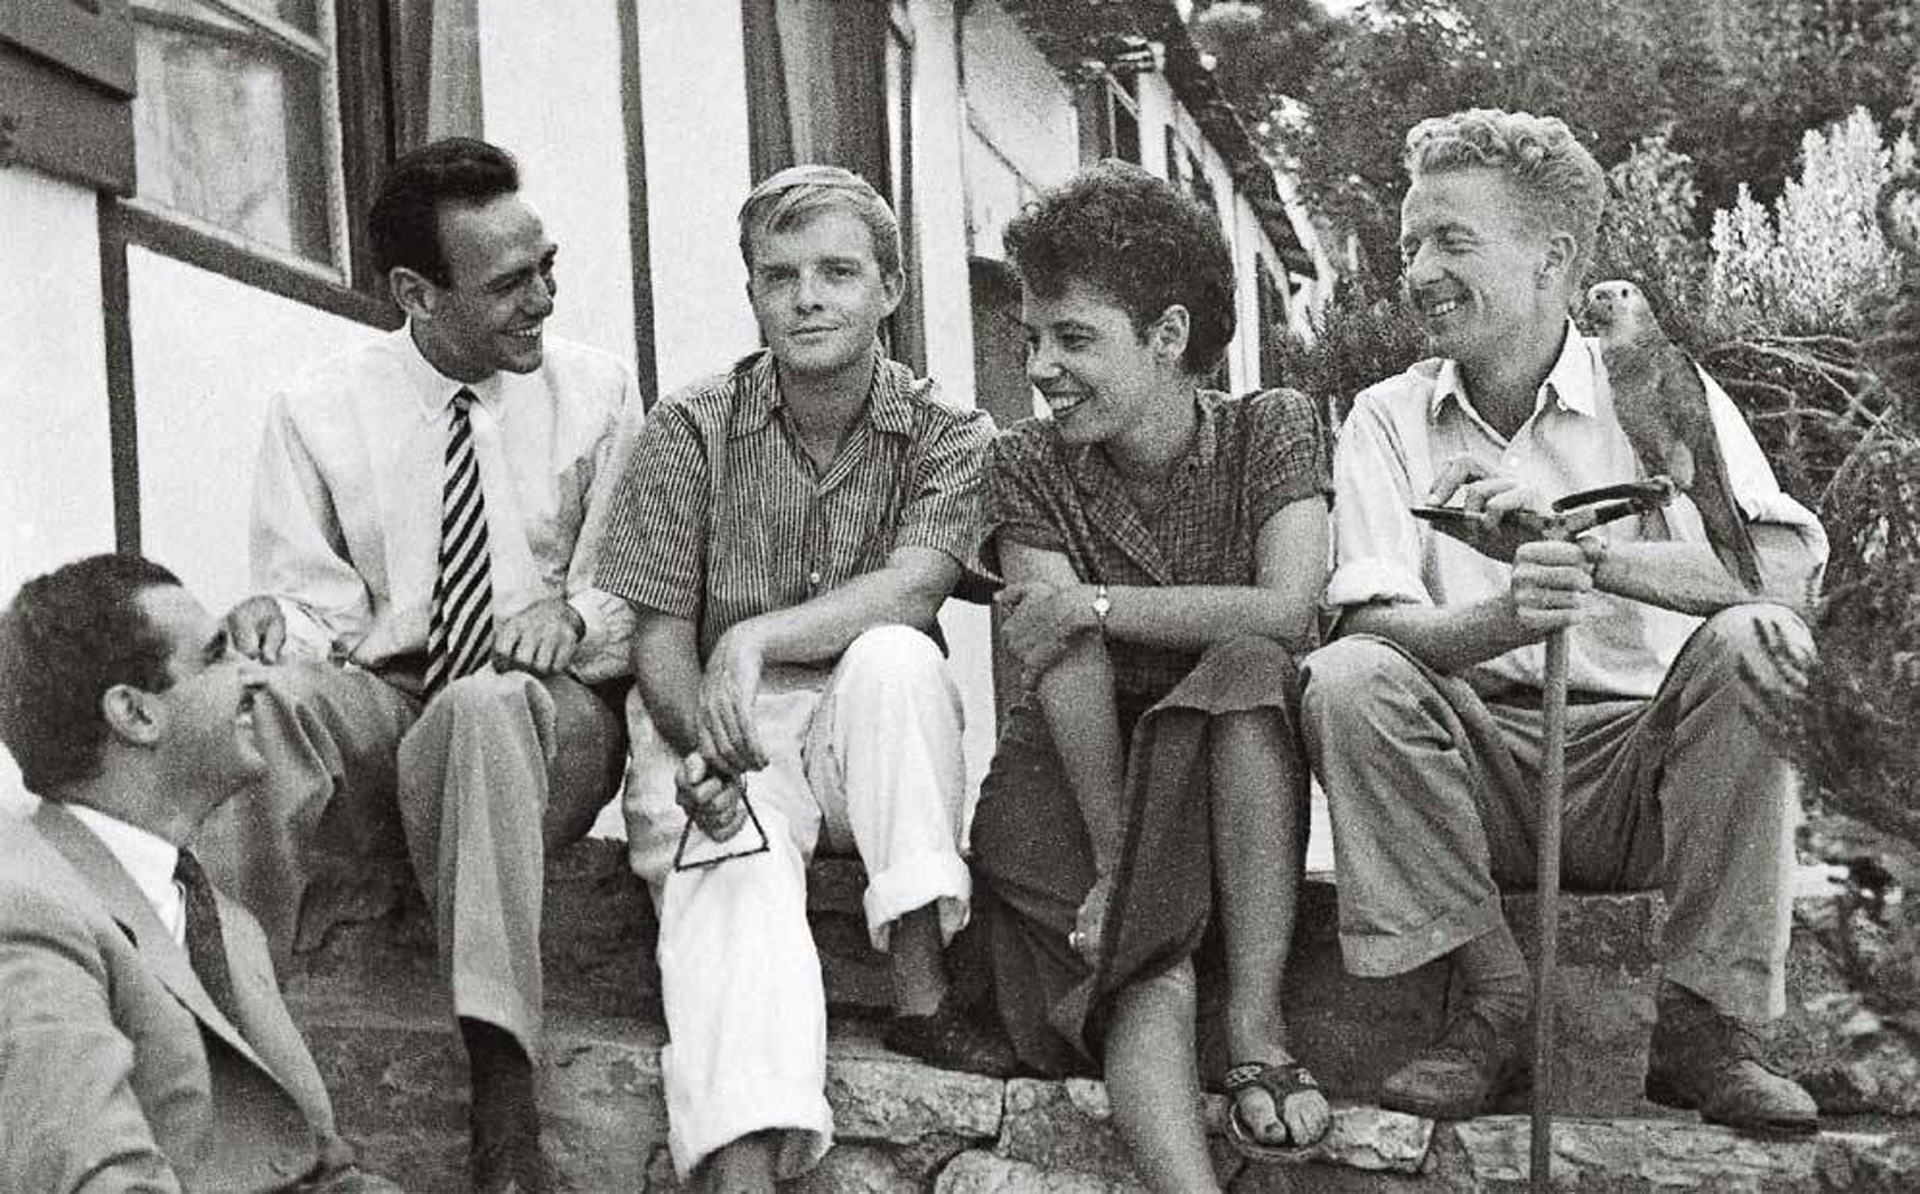 Emilio Sanz de Soto, Pepe Carleton, Truman Capote y Jane y Paul Bowles (Tanger 1949)